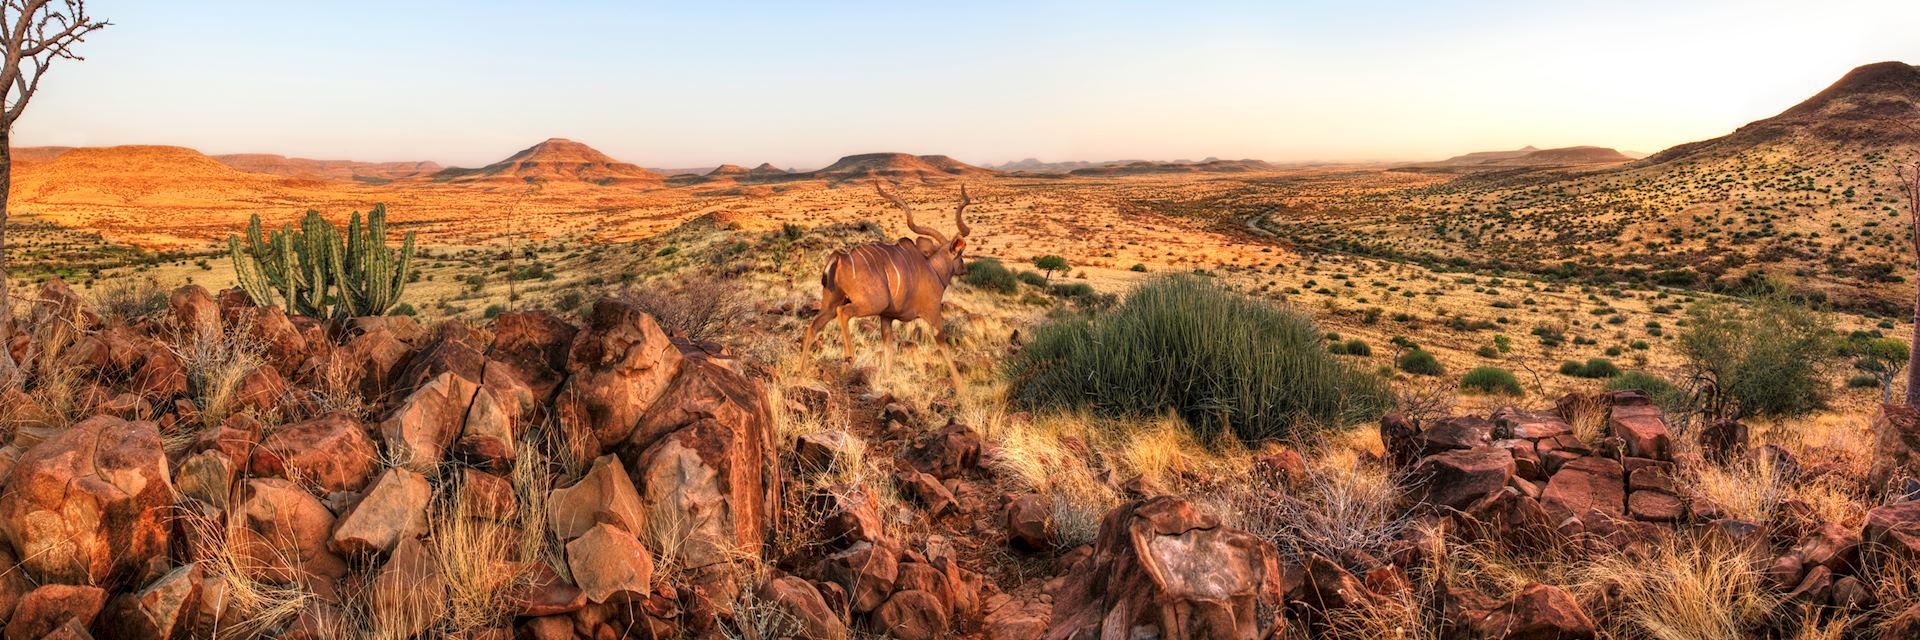 Kudu in Damaraland in Namibia